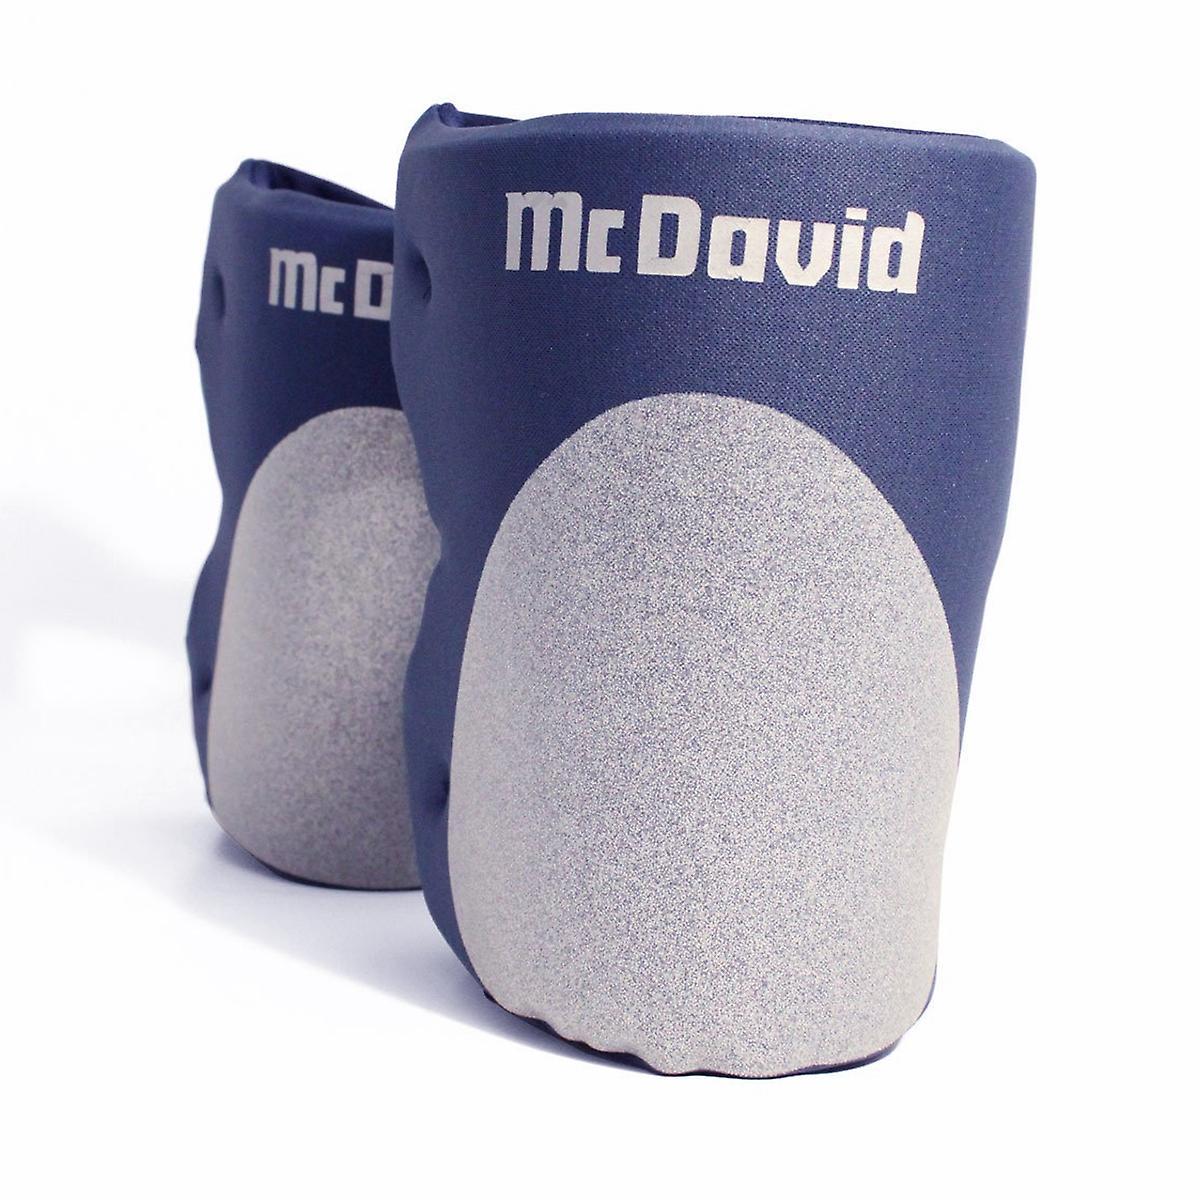 McDAVID volleyball knee pads [navy/silver]